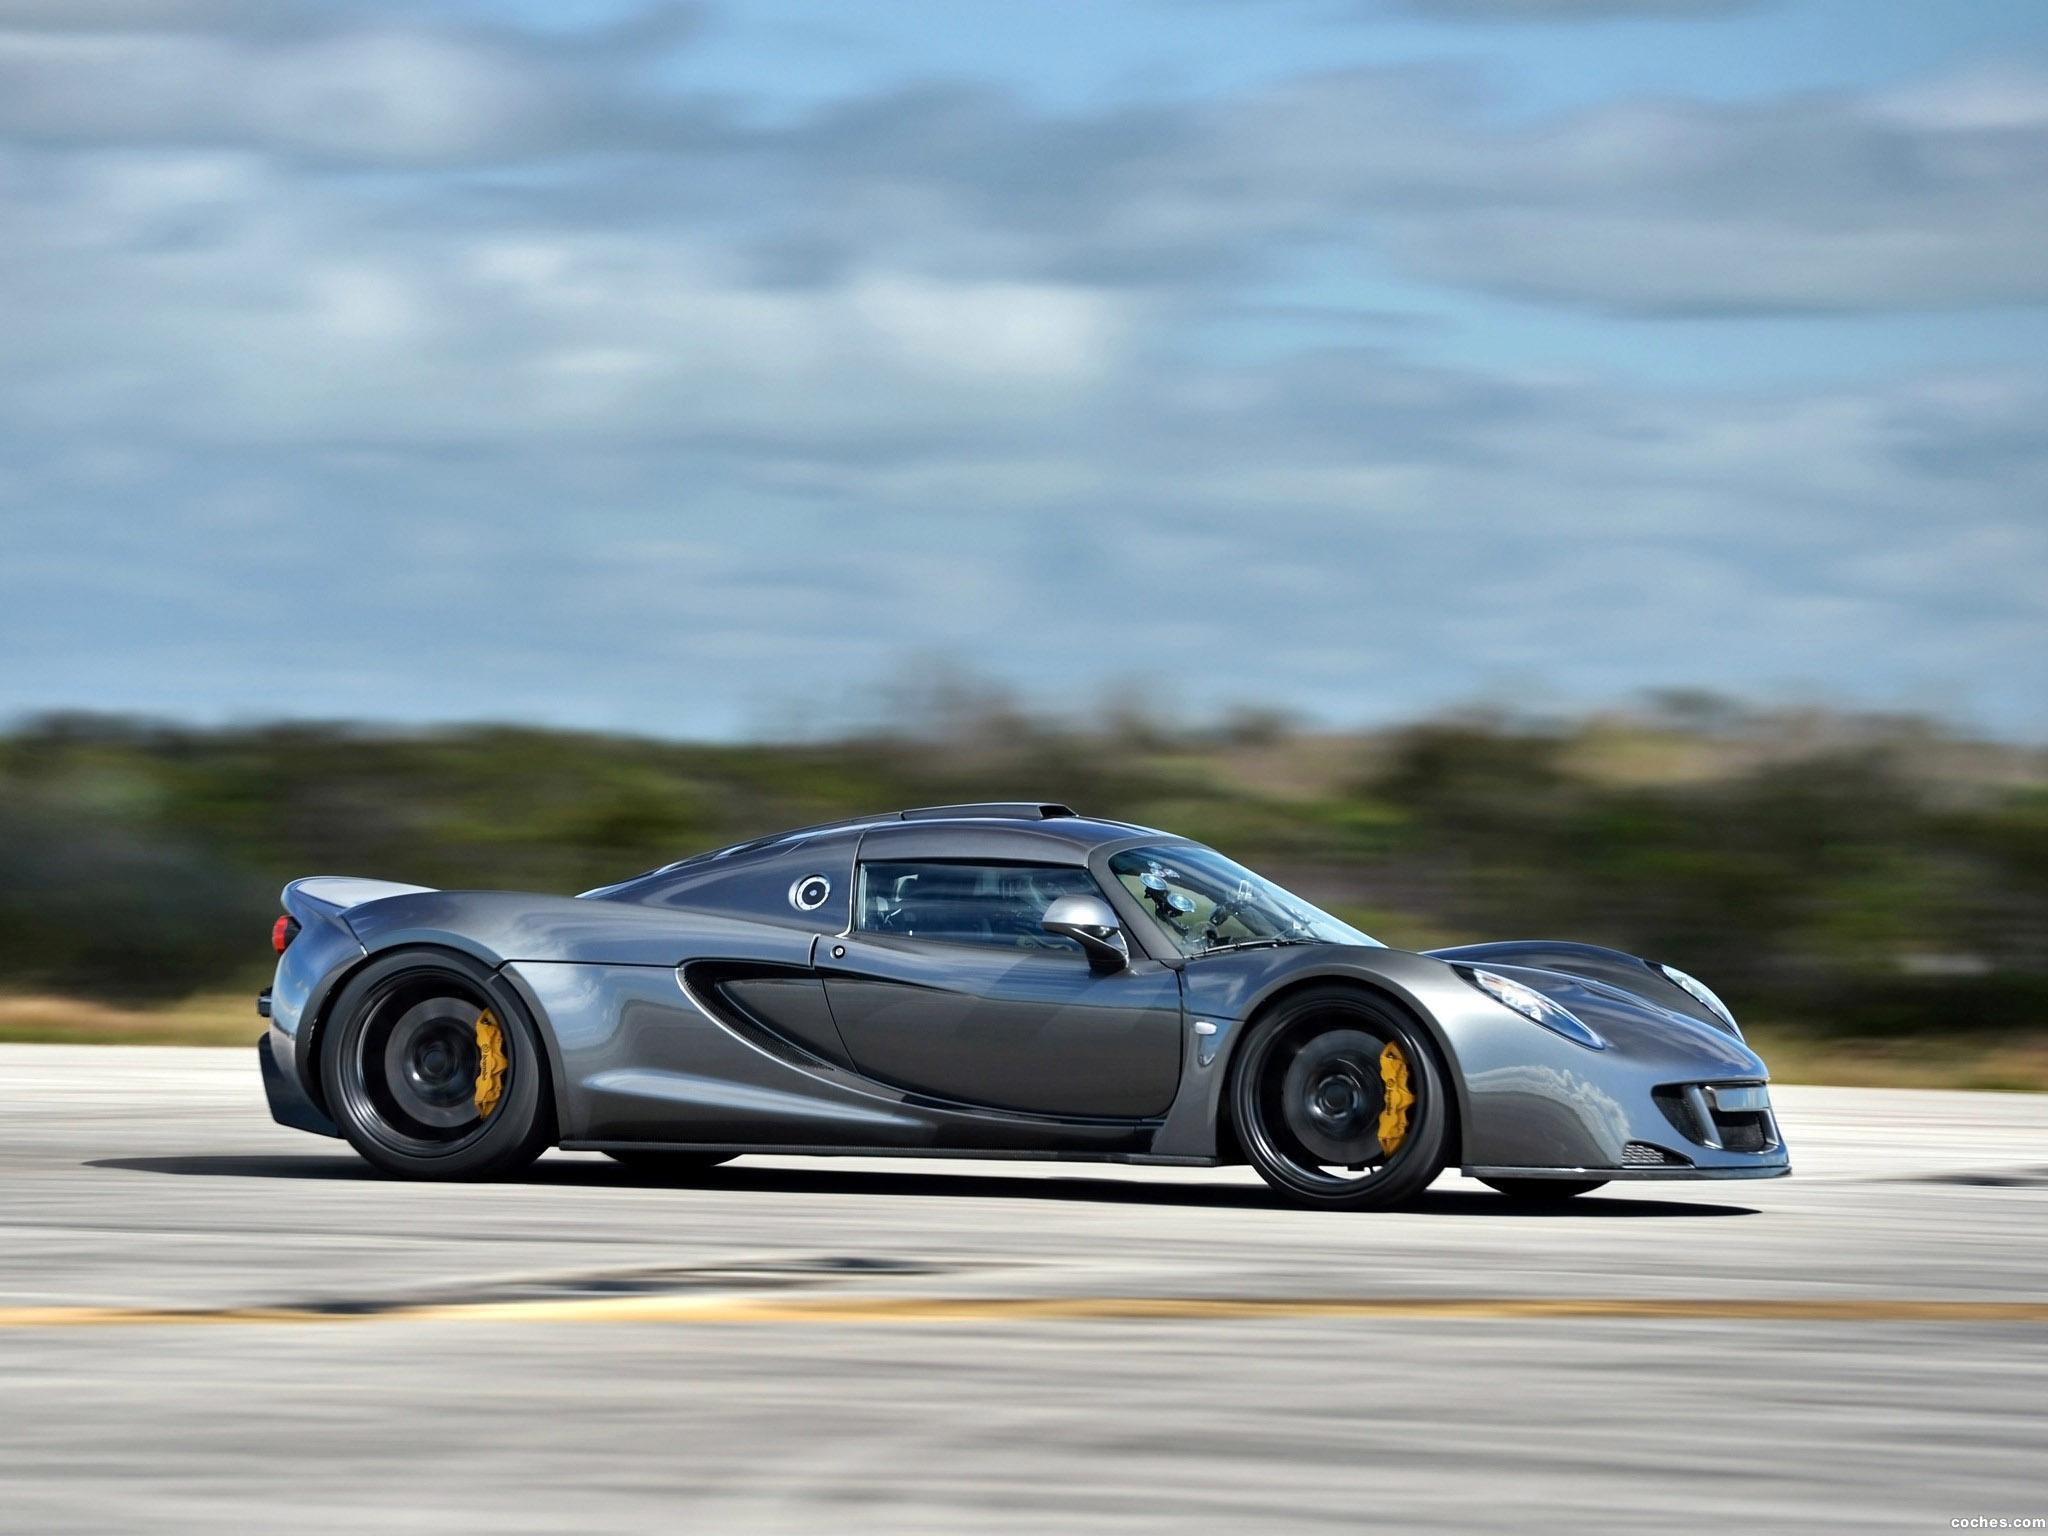 Foto 6 de Hennessey Performance Venom GT World Speed Record Car 2014